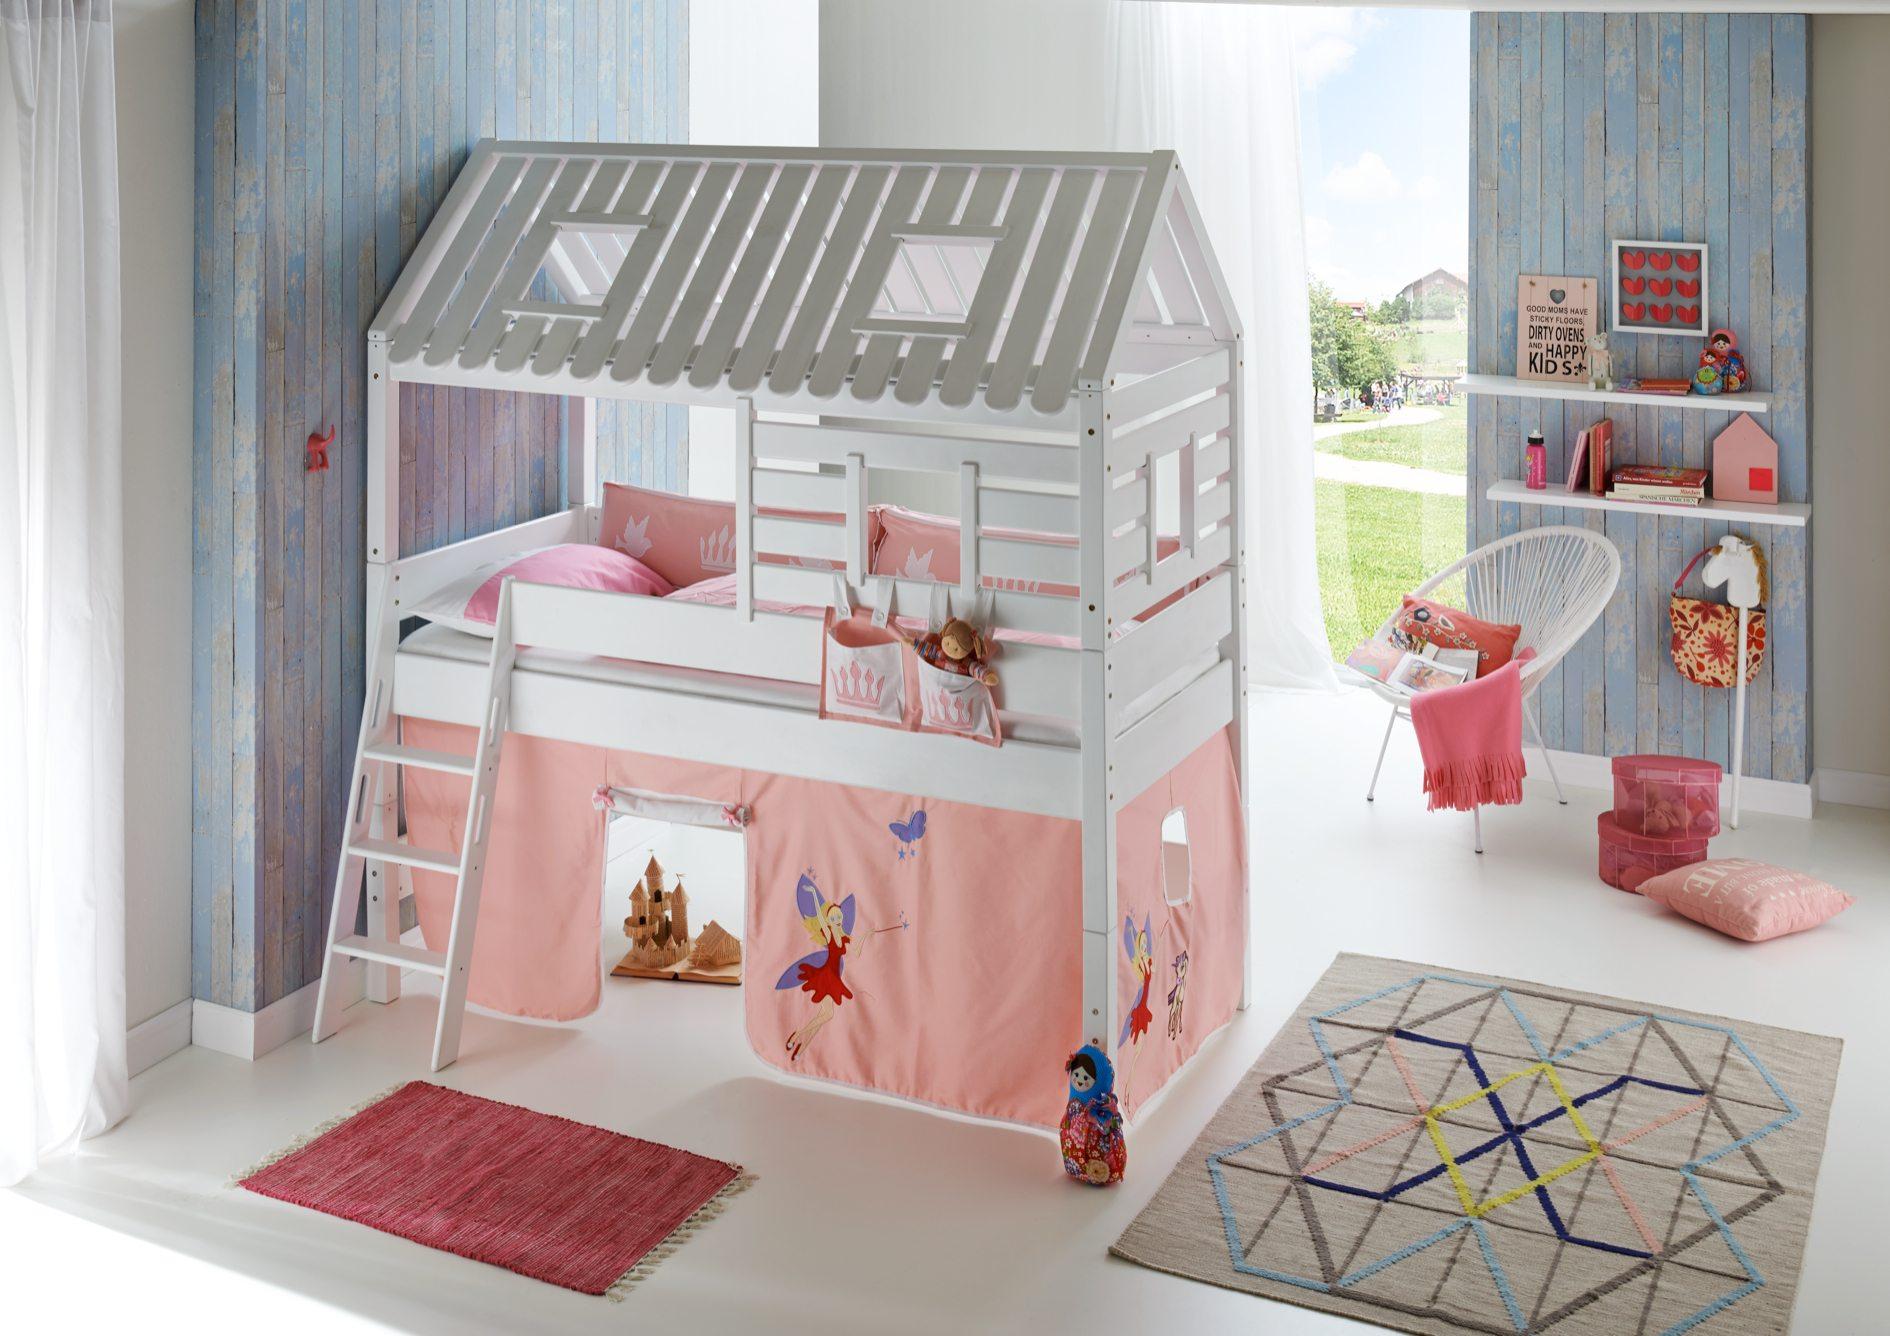 hochbett tom s h tte 2 kinderbett spielbett bett wei stoffset lila rosa kids teens betten. Black Bedroom Furniture Sets. Home Design Ideas